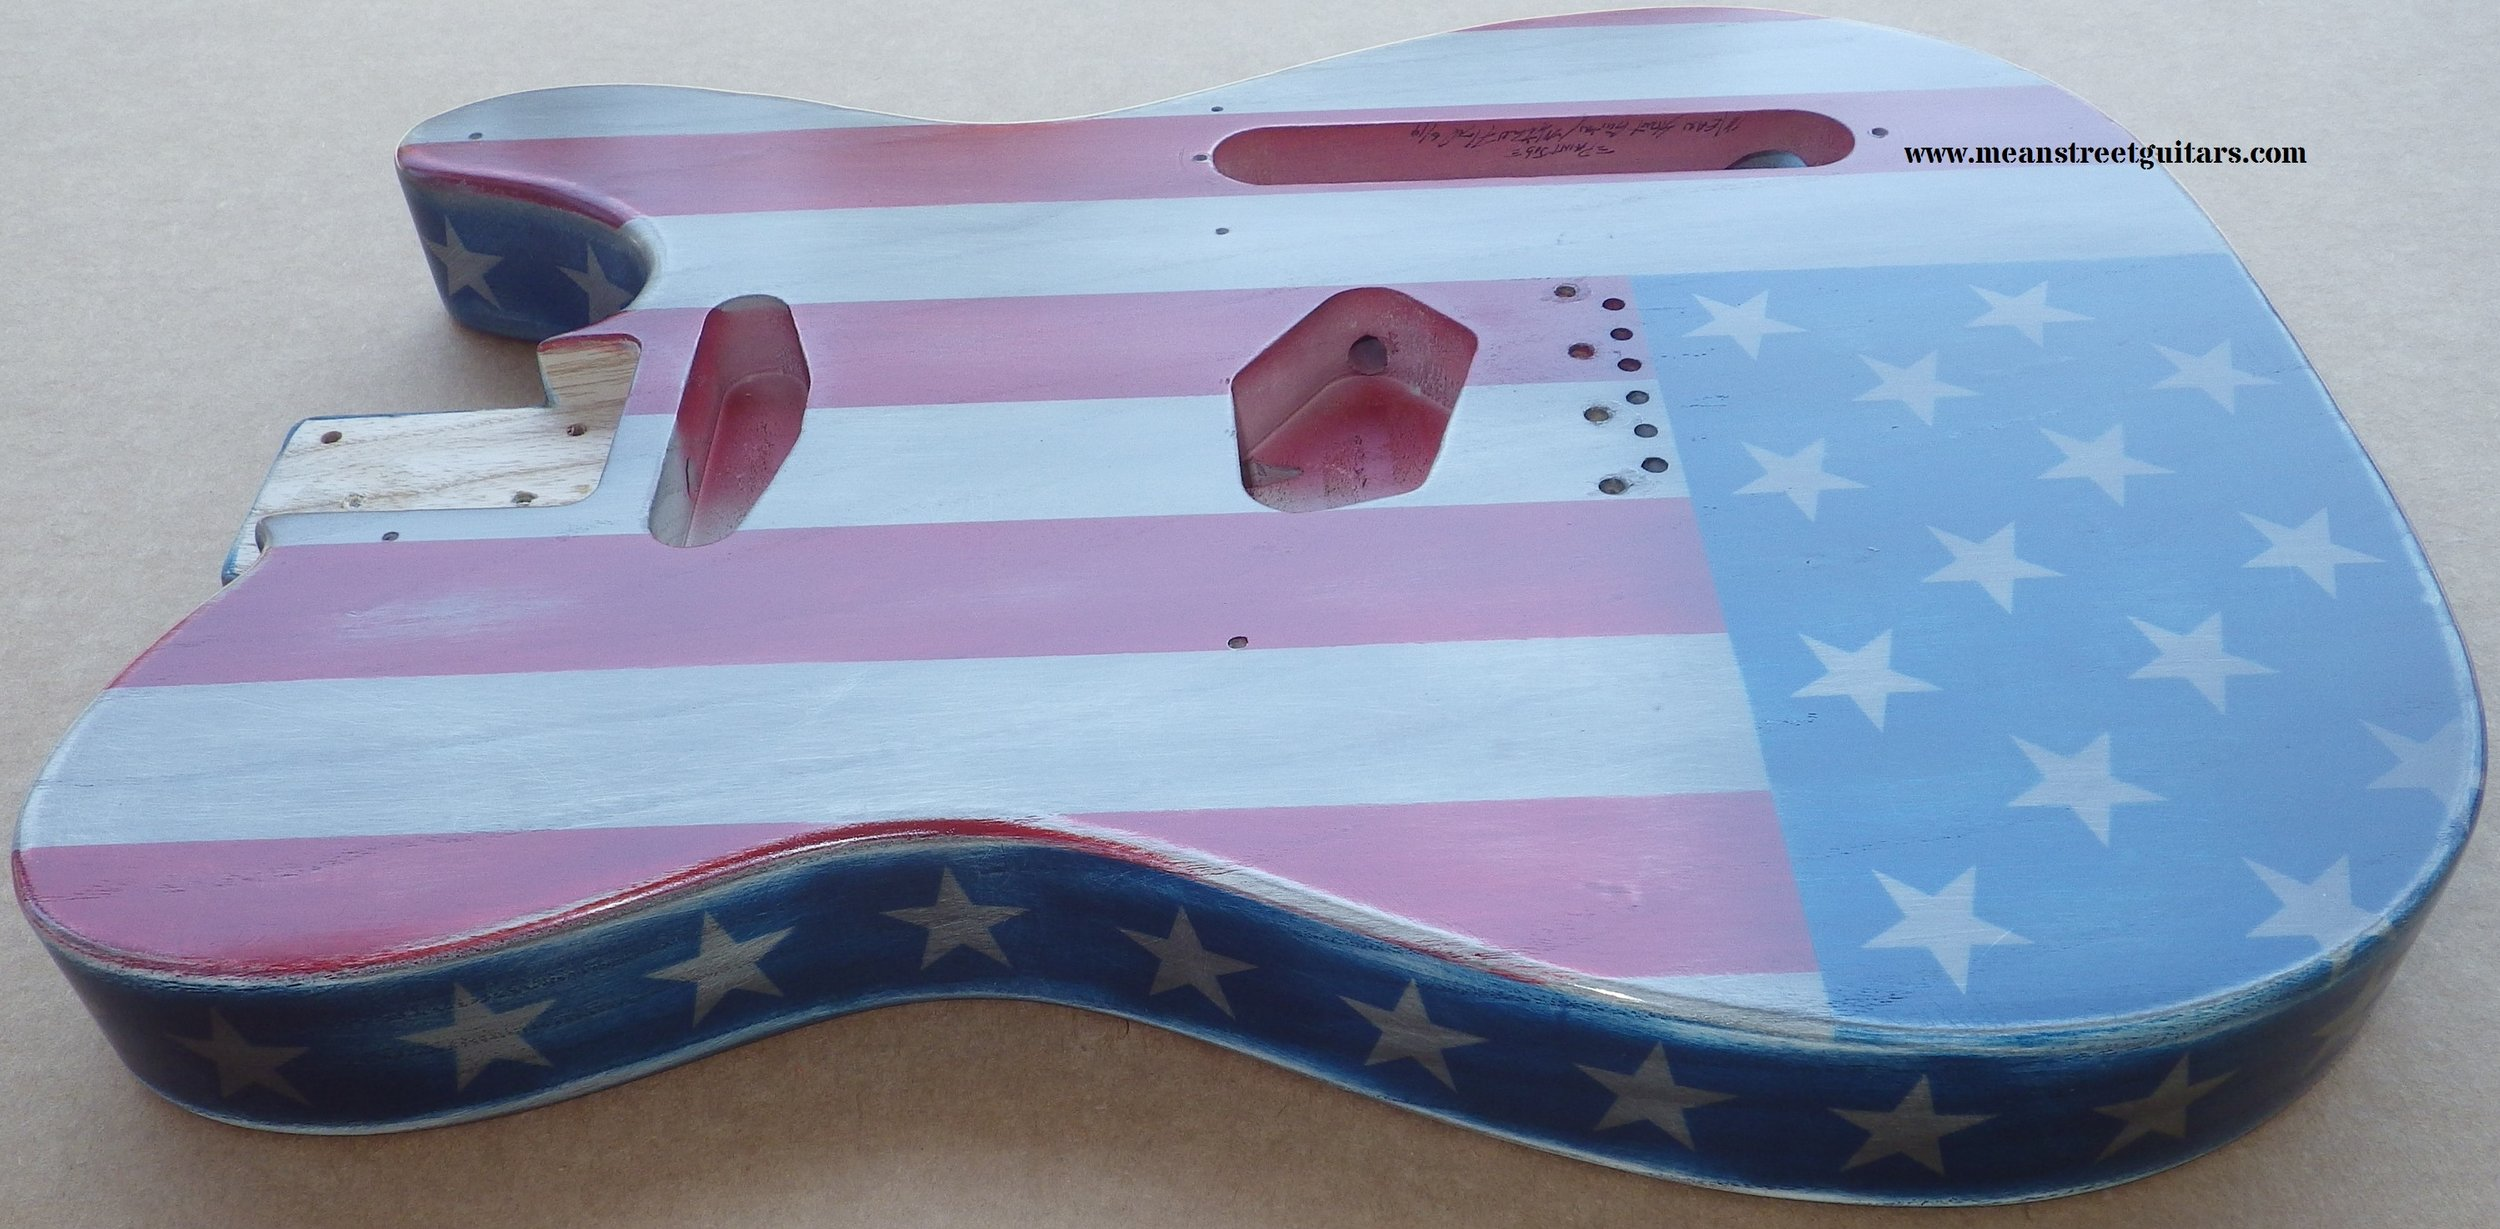 Mean Street American Flag Tele relic paint job Shawne P pic 6.jpg